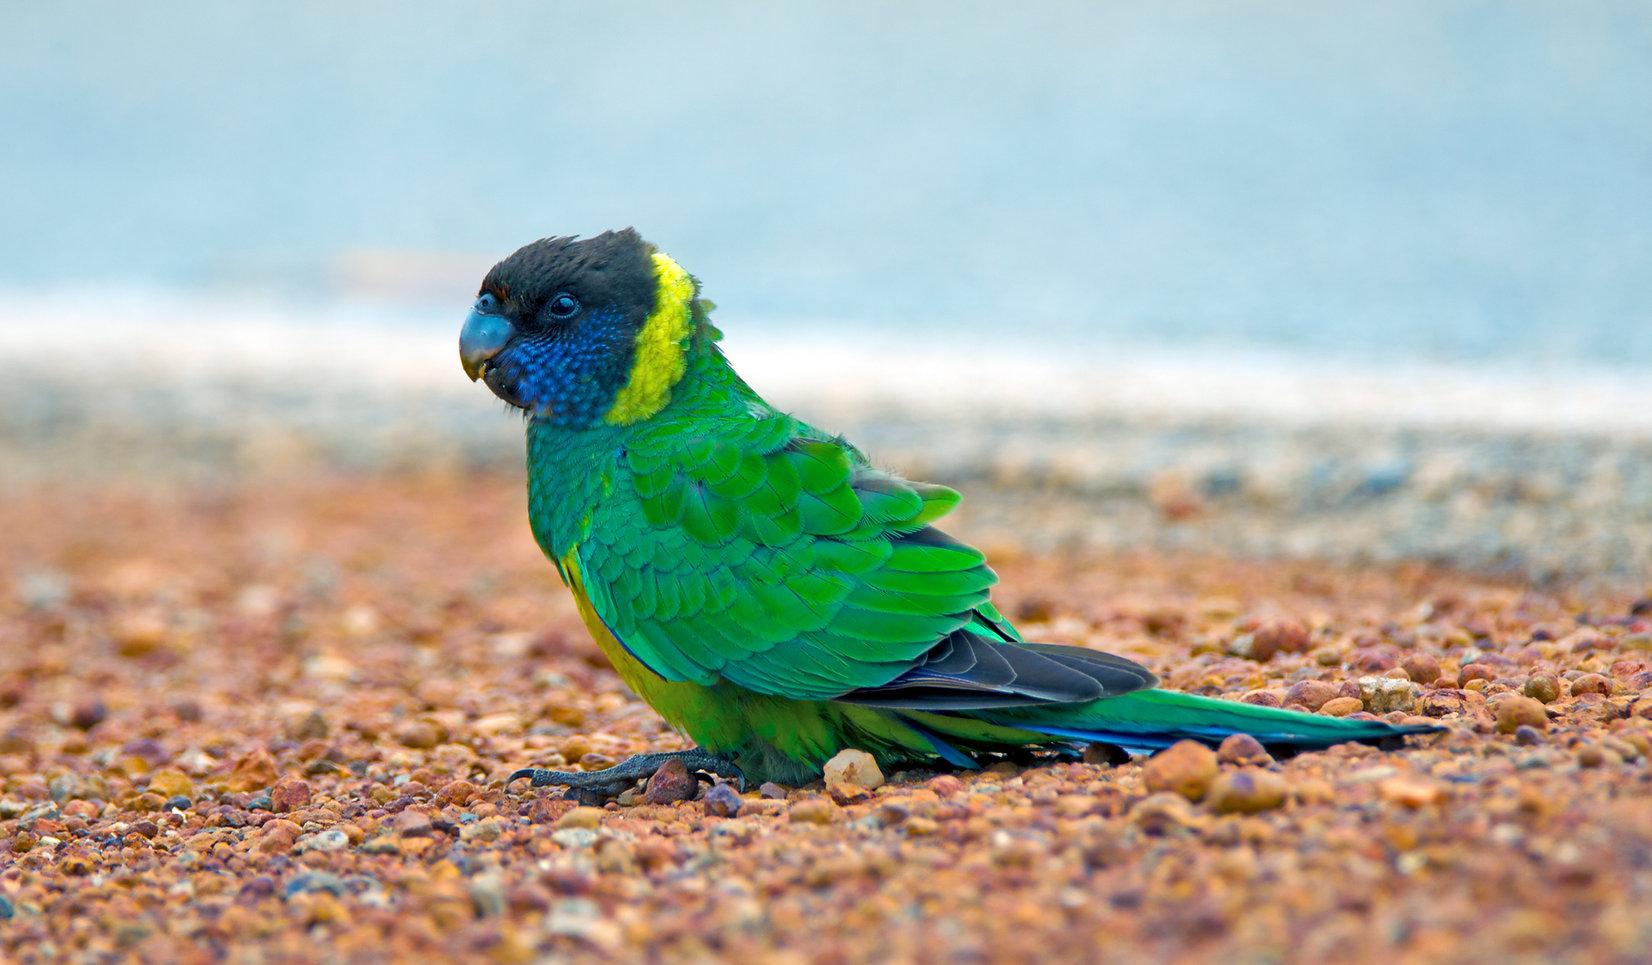 Twenty-eight Parrot